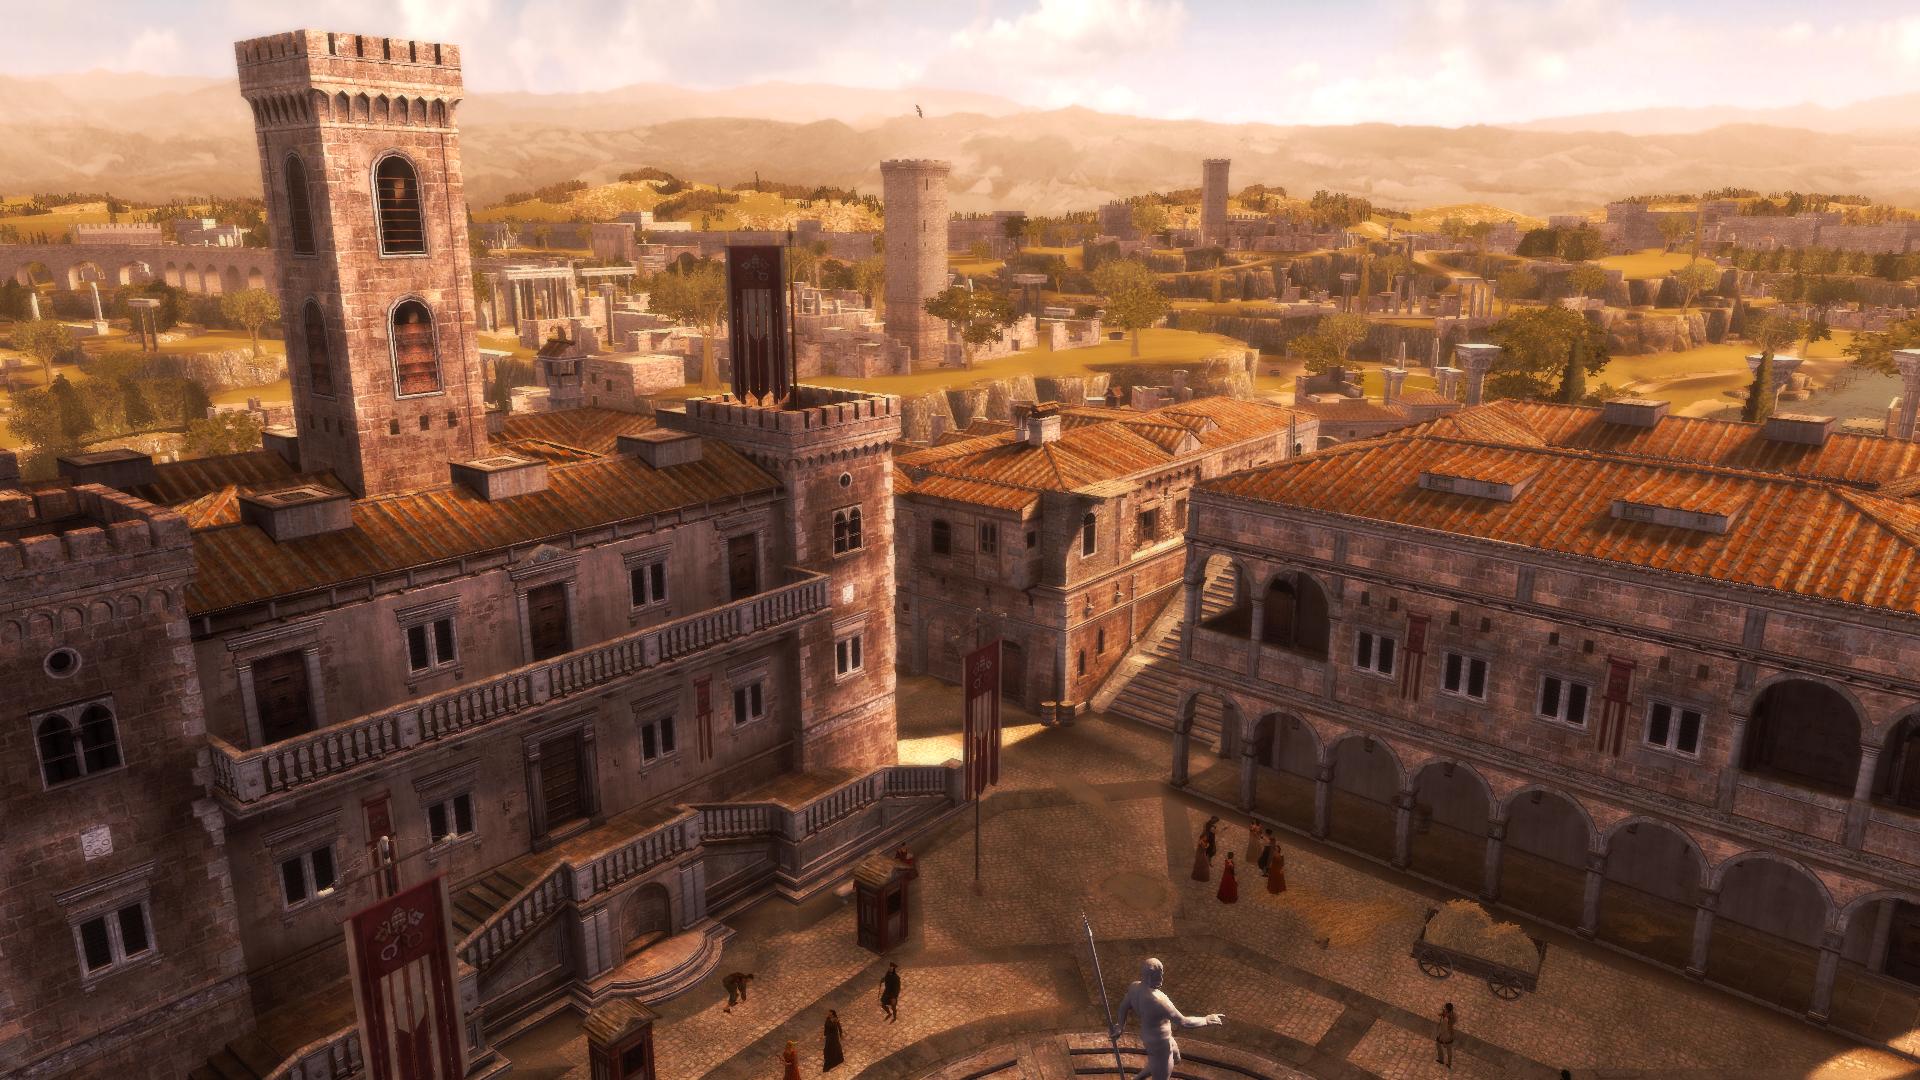 Citt di San Gimignano Toscana City of San Gimignano Tuscany Assassin s creed II Architecture in Assassin s Creed